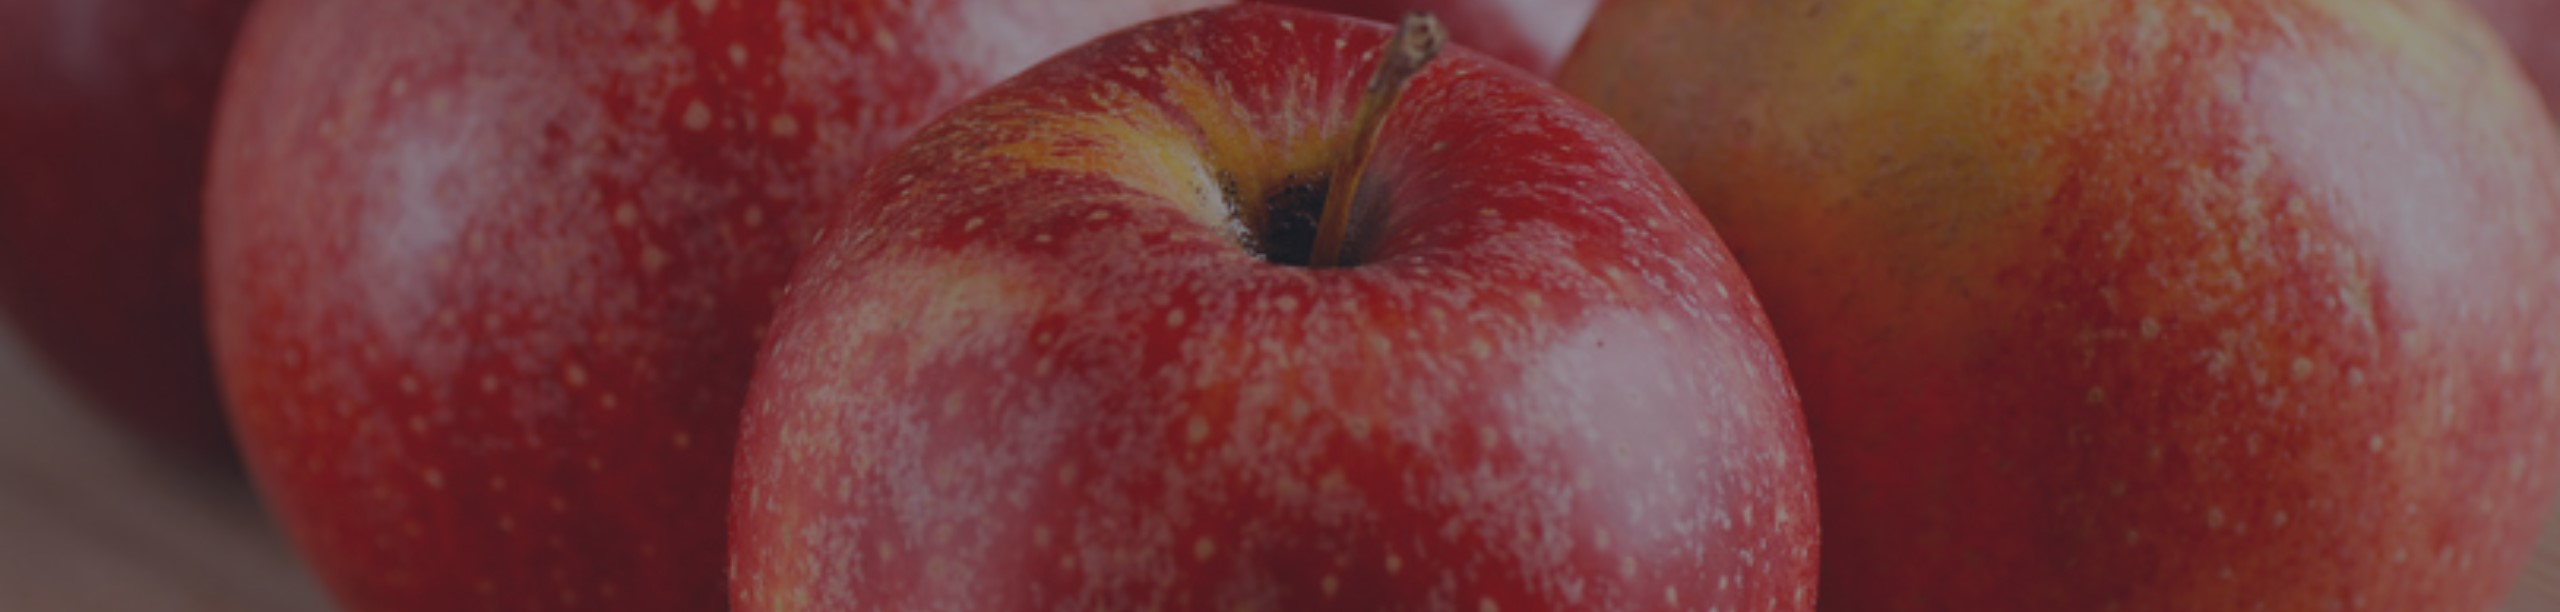 Apples1-2